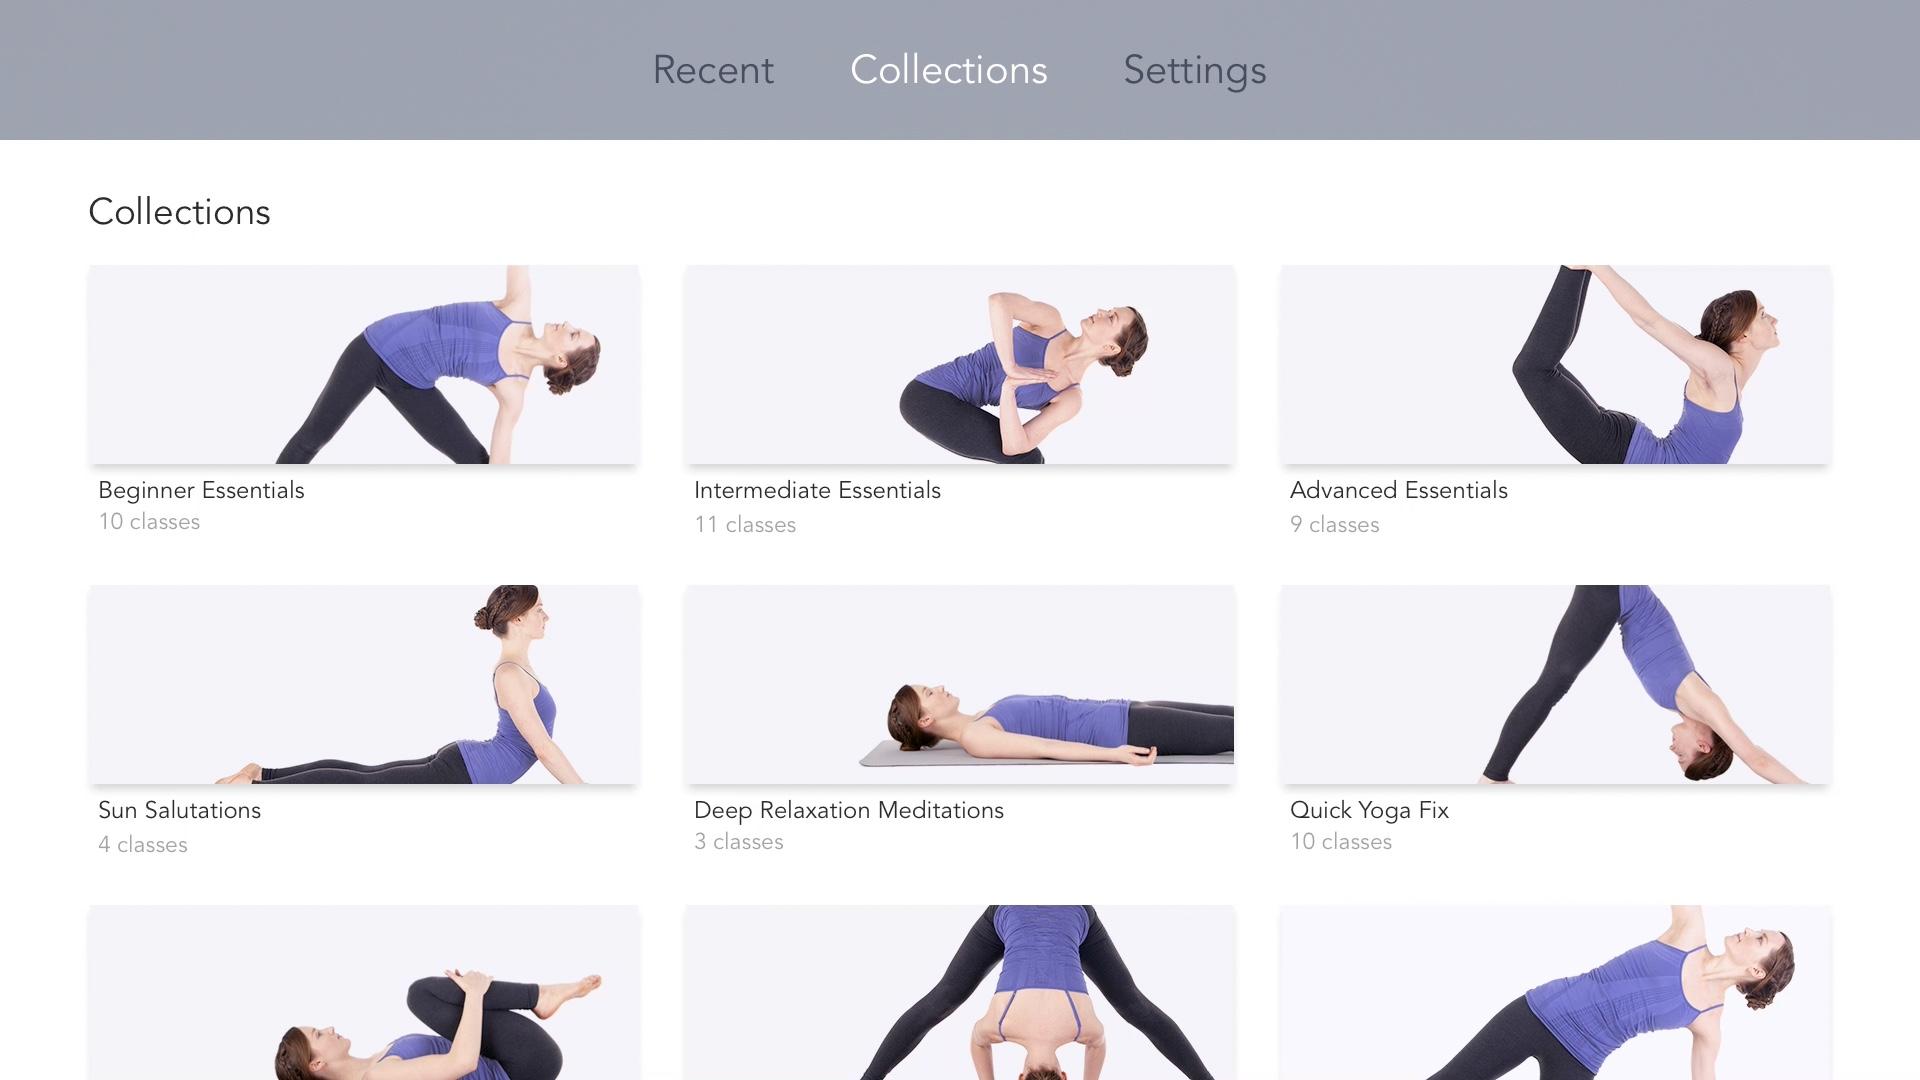 Yoga Studio for Apple TV